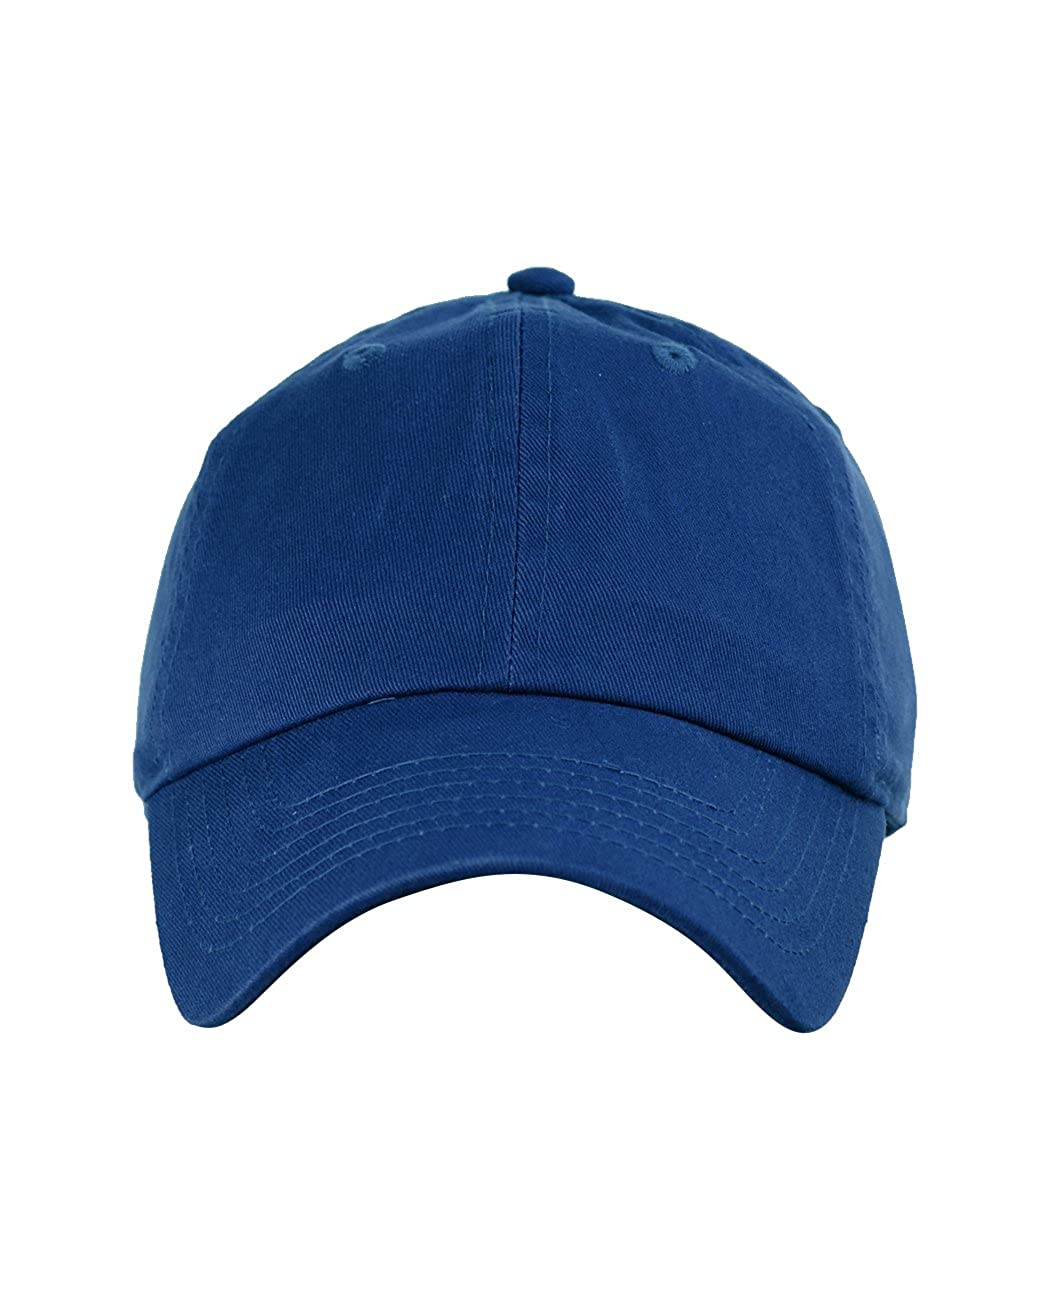 NYFASHION101 NYFASHION101 Unisex Adjustable 6-Panel Low-Profile Baseball Cap  LOW100- HG ROYAL BLUE  Amazon.in  Clothing   Accessories 62636f6dfb5f